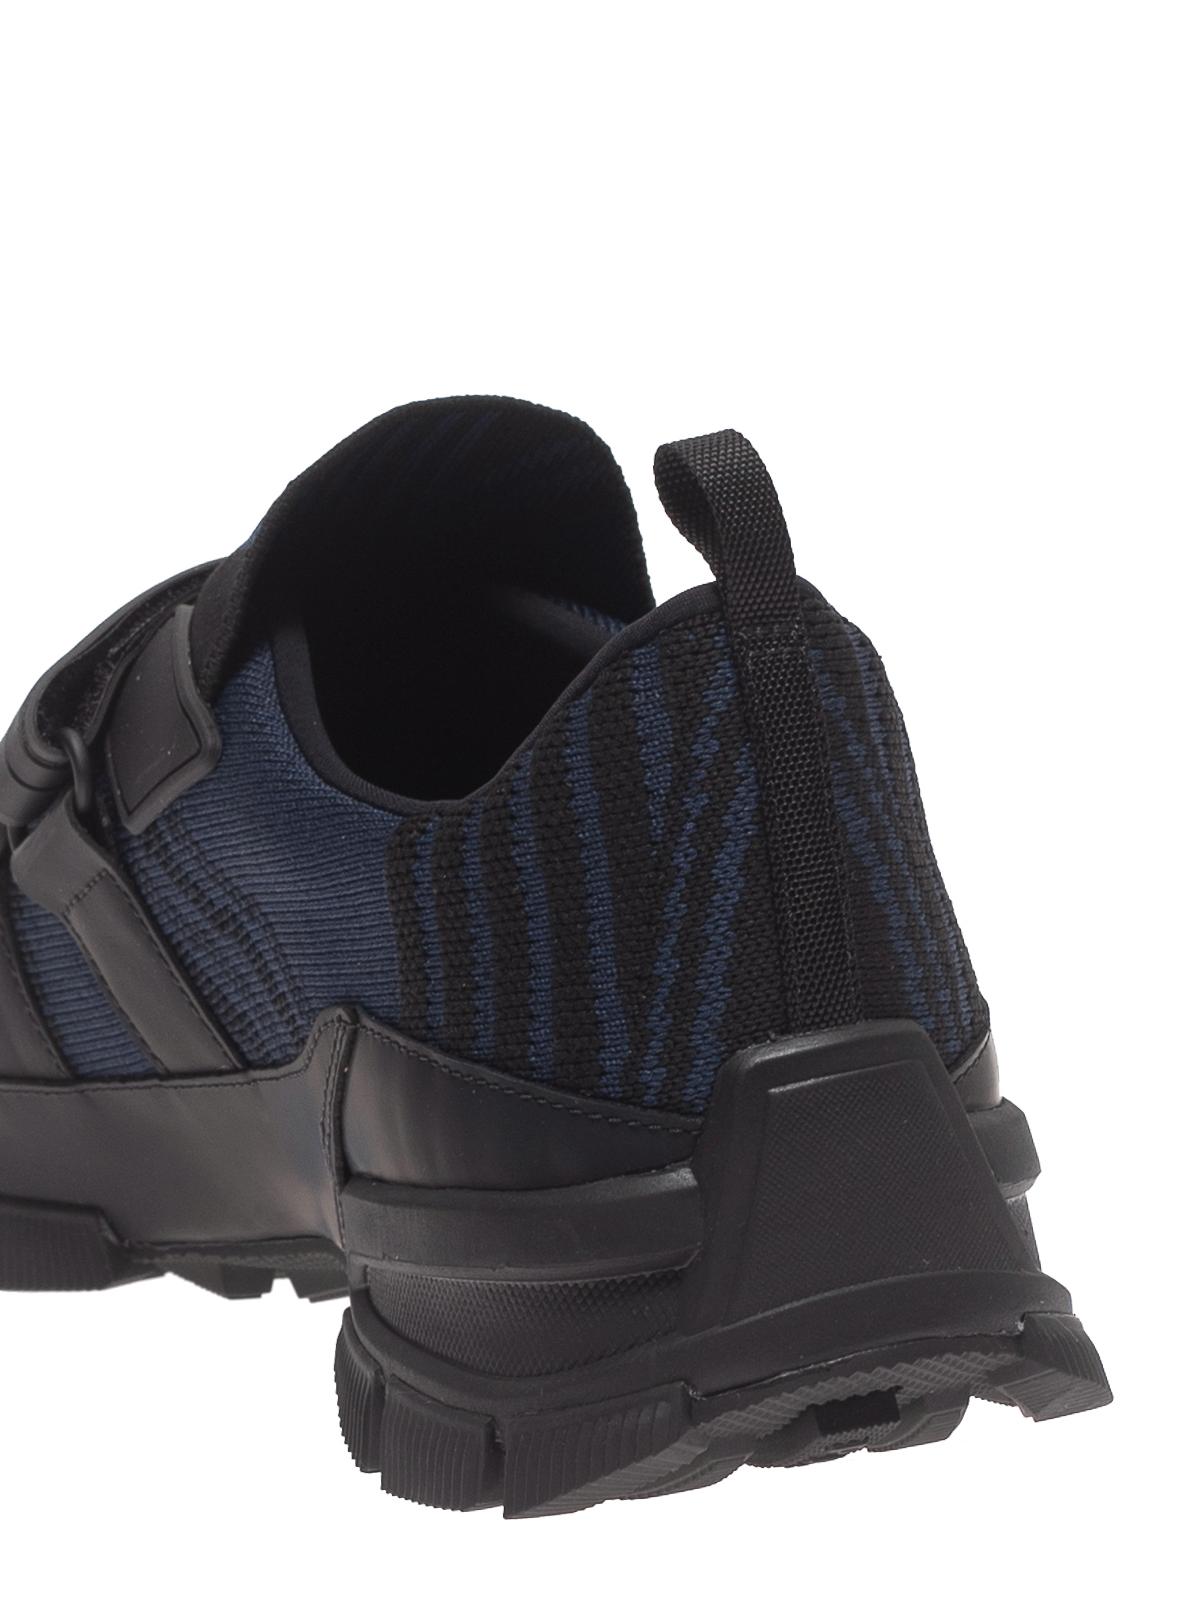 Prada - Crossection knit sneakers